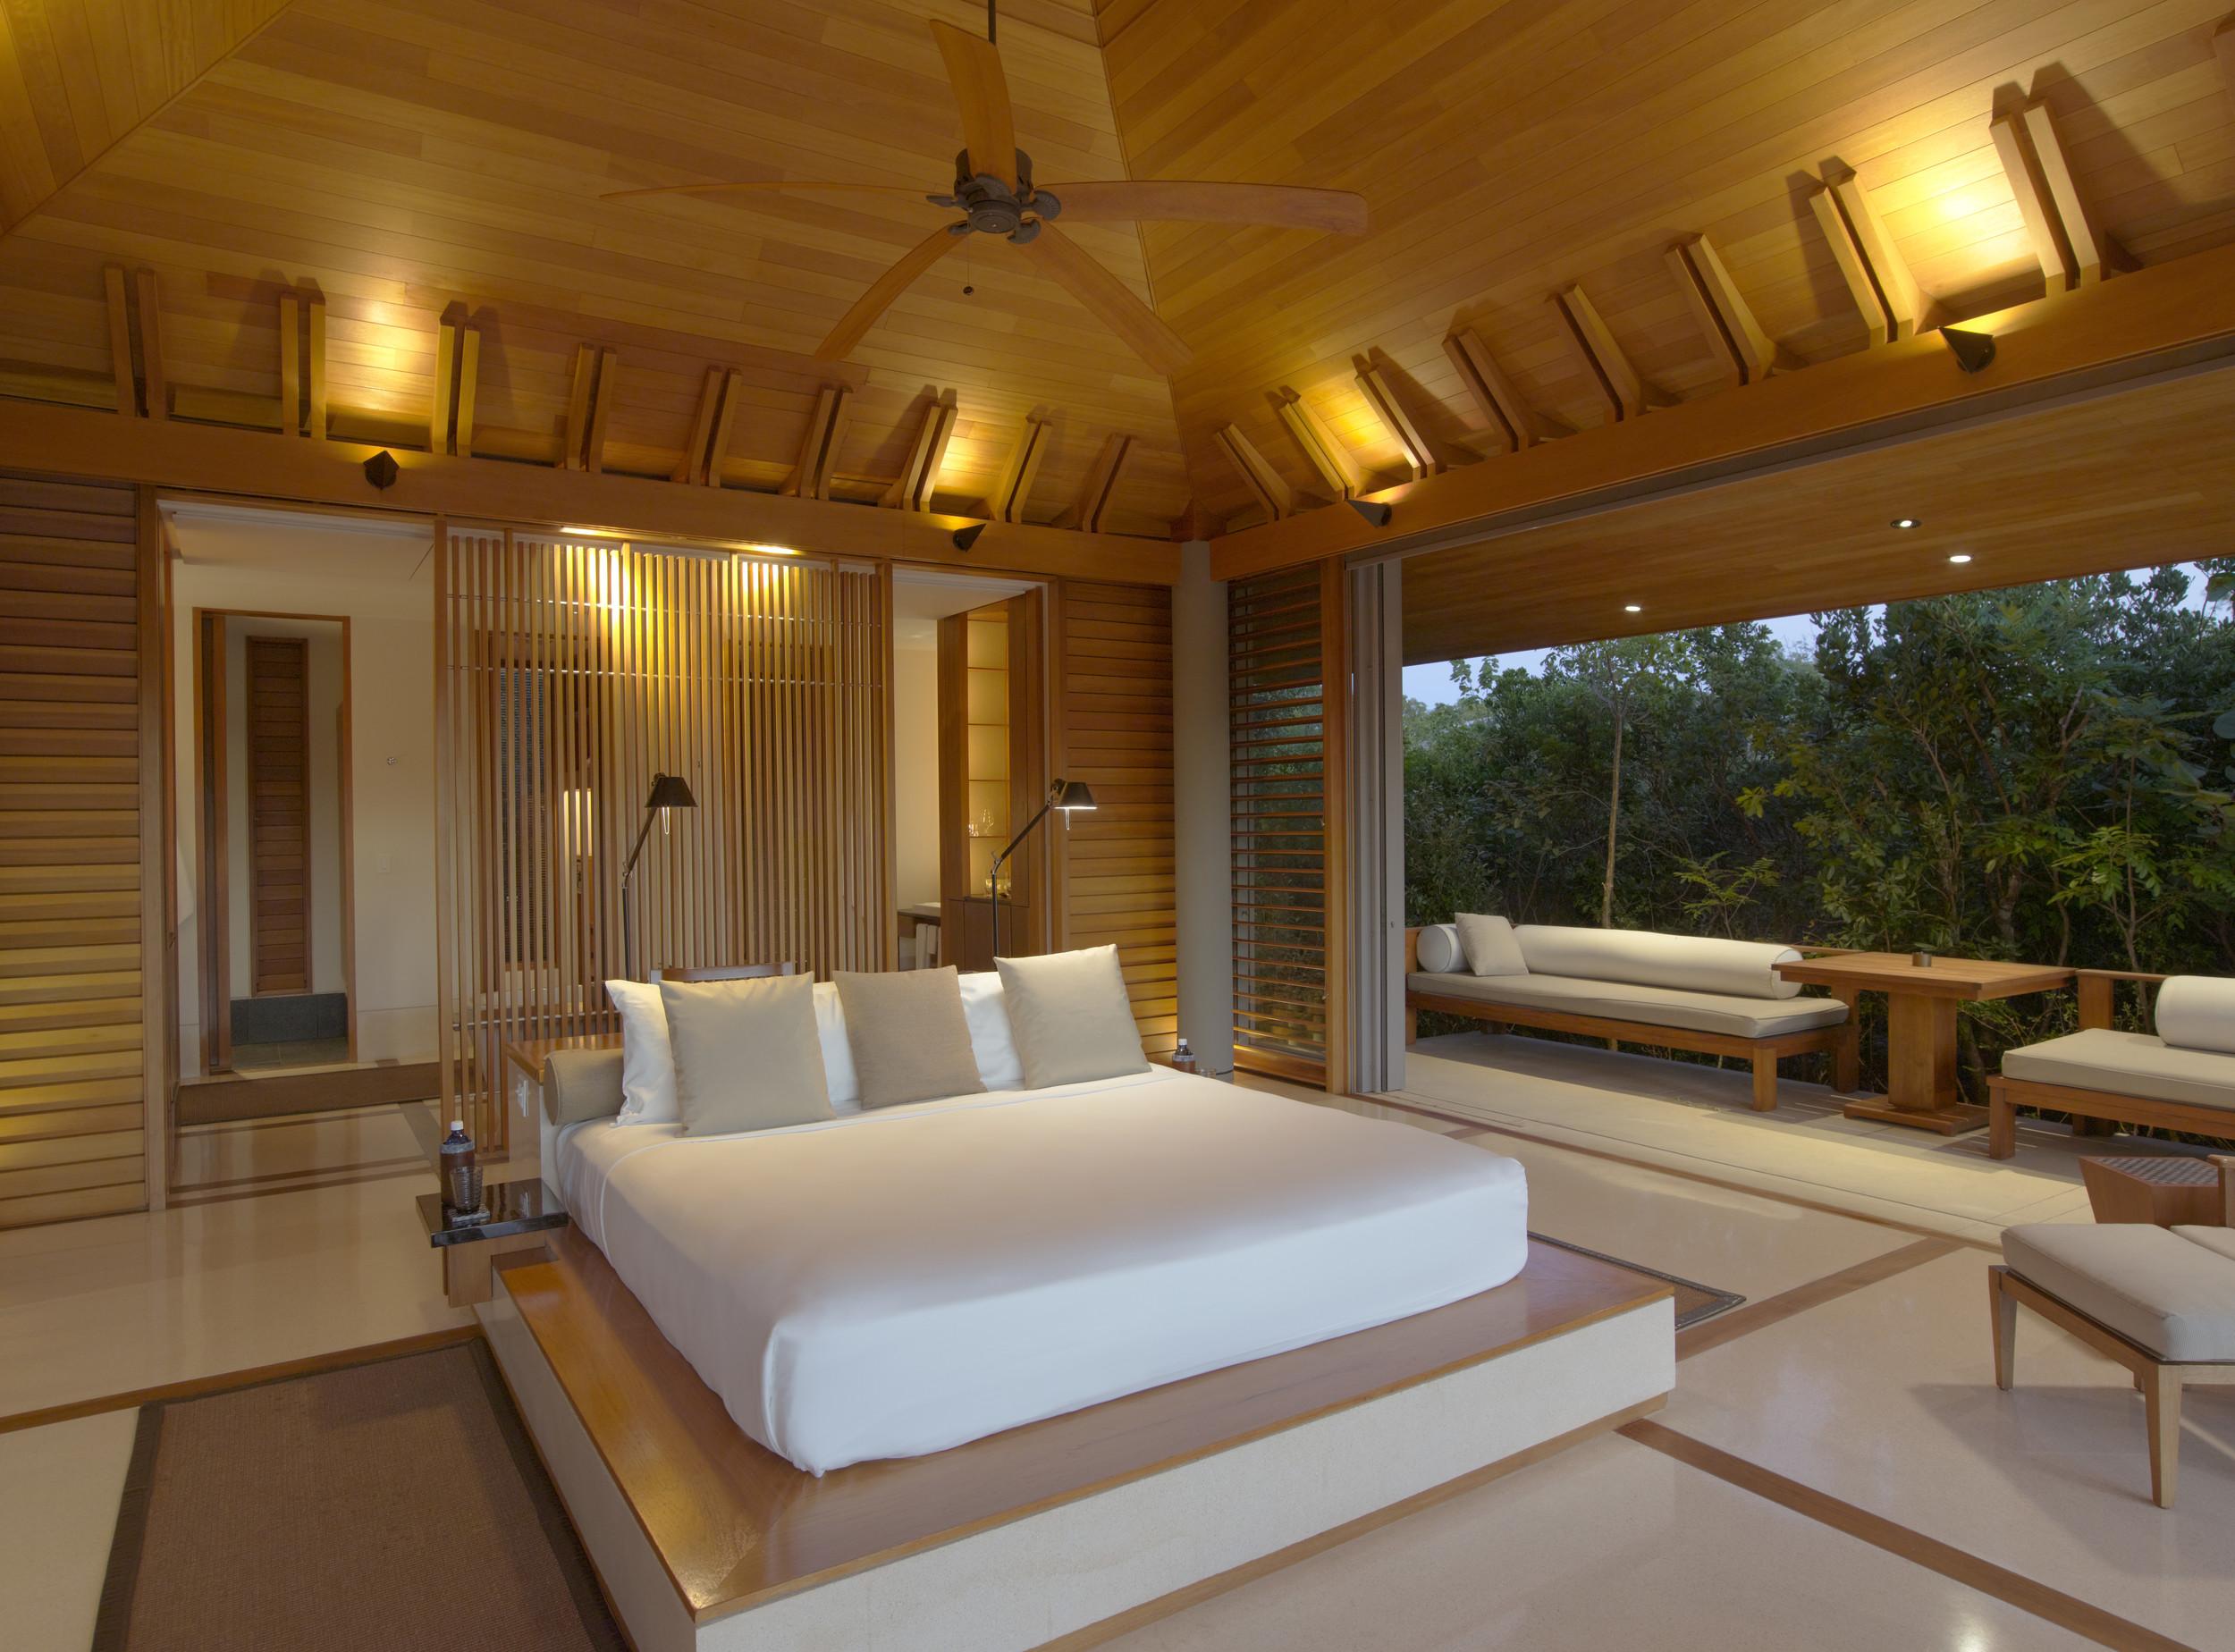 RS679_Amanyara - Pavilion Bedroom-hpr.jpg